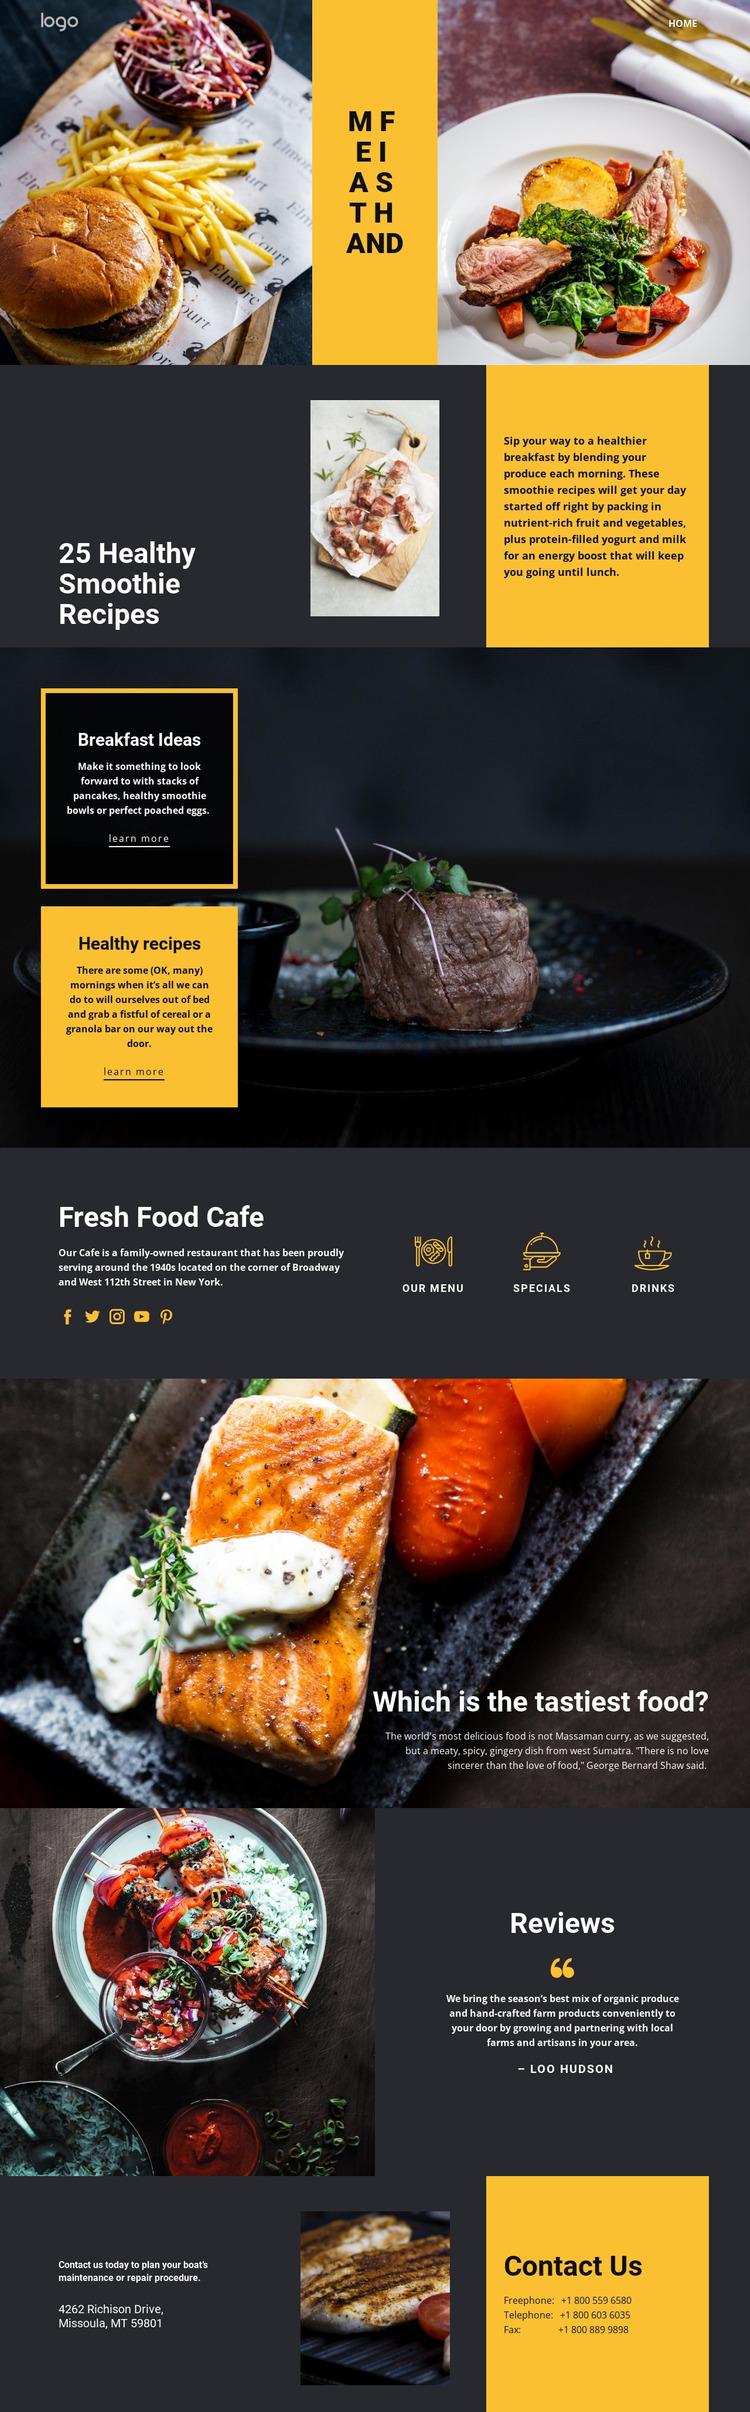 Good recipes for good food Website Mockup